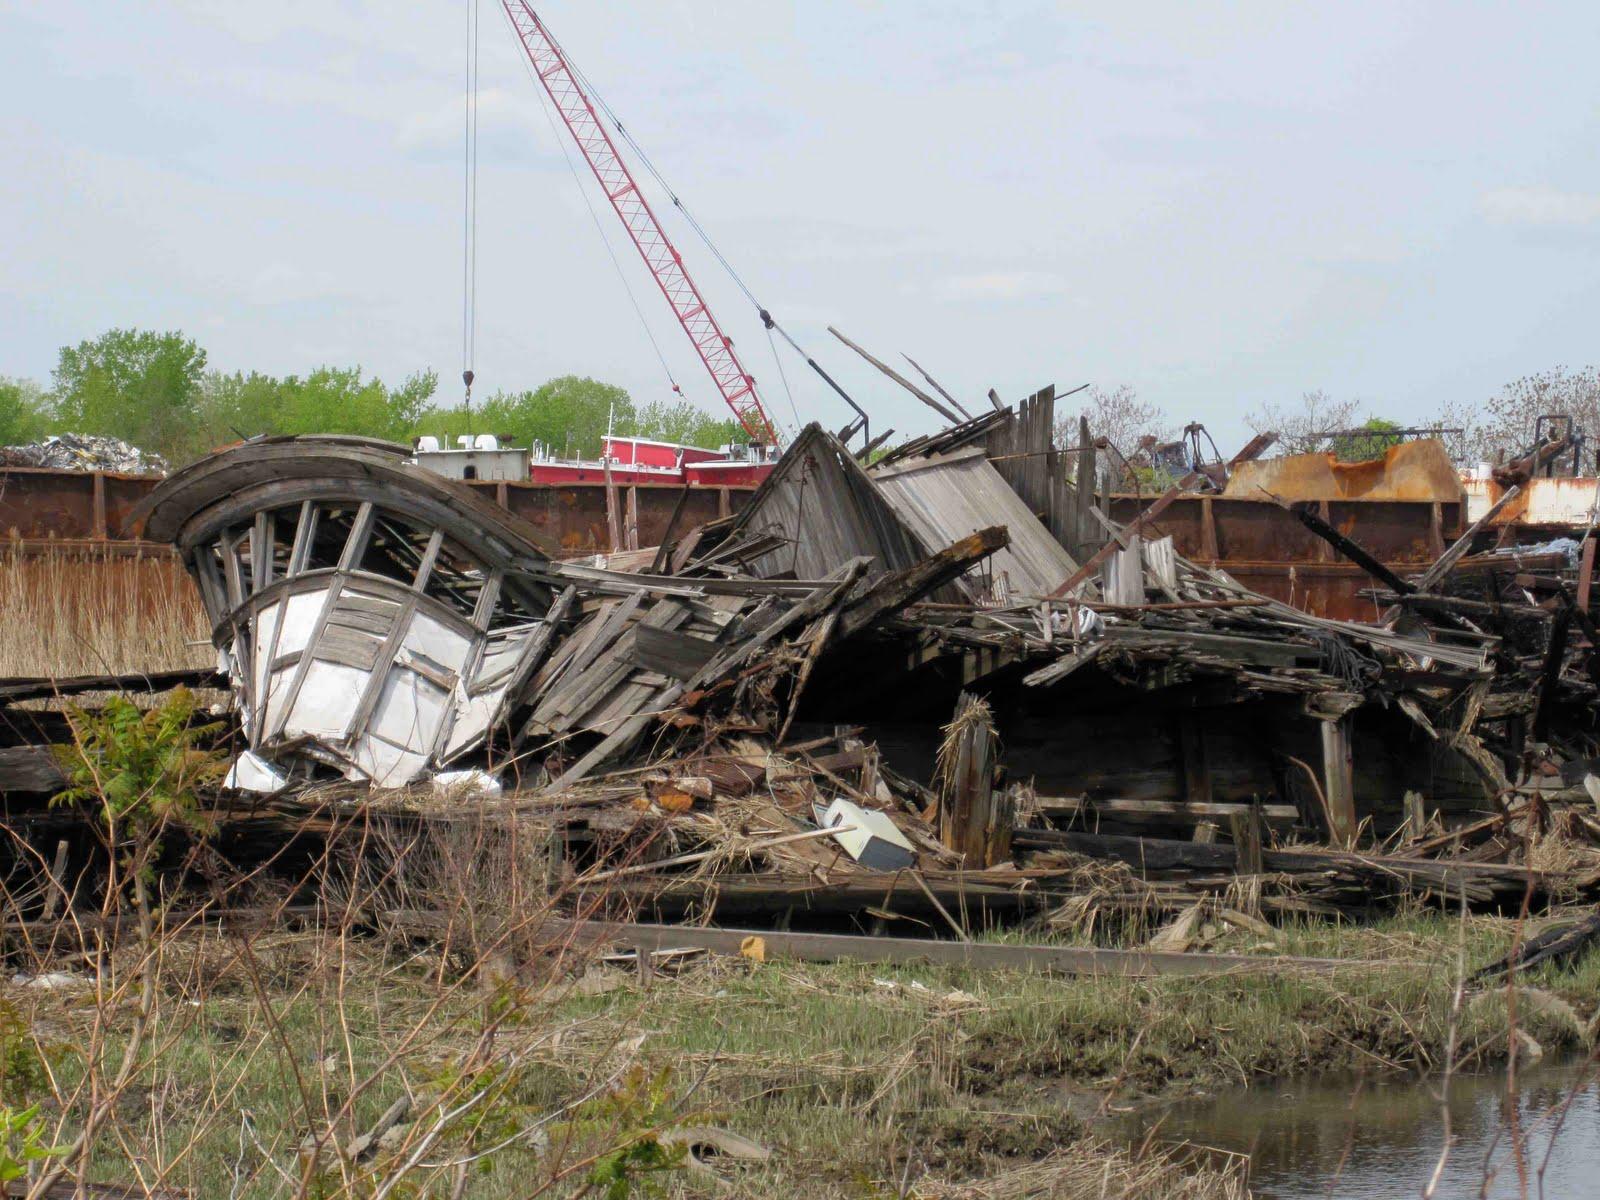 Boat Motor Salvage Yard All Boats